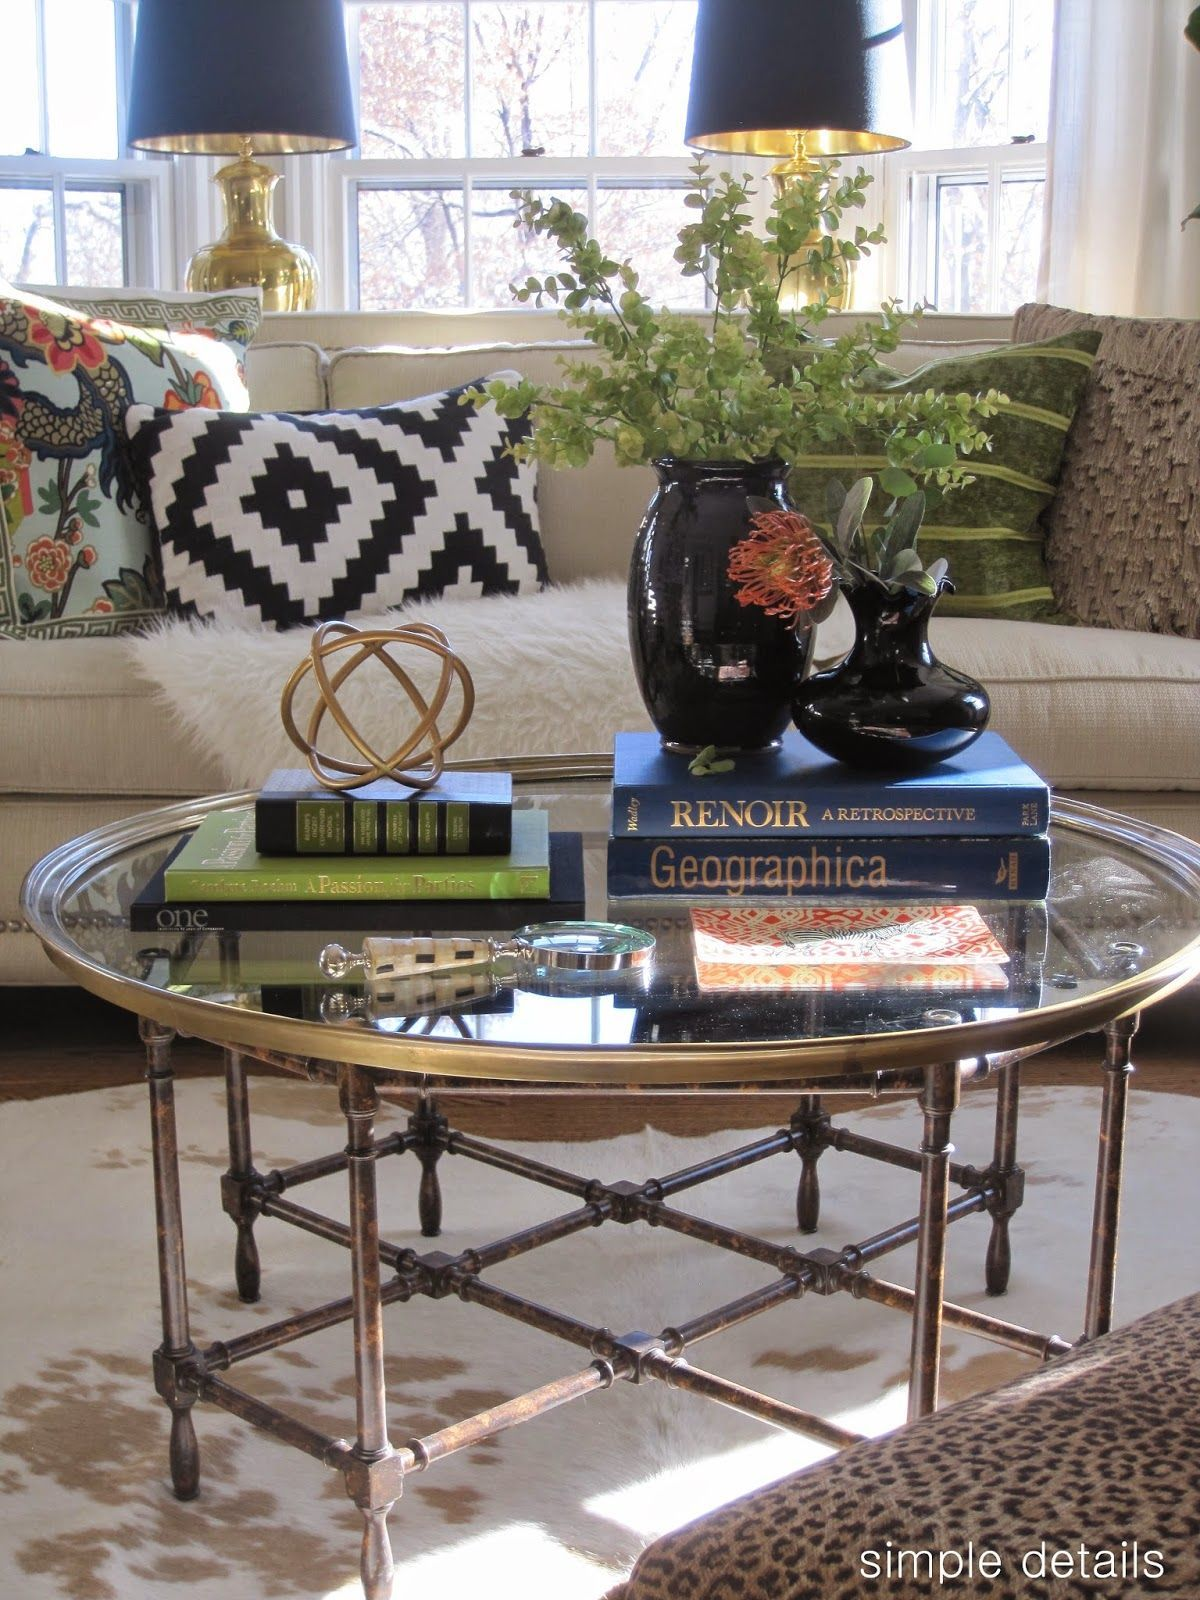 Furniture Design Ideas With Interior Living Room Simple And Stylish Clear Glass Oval Top Coffee Table Steklyannye Stoly Stolik Dlya Kofe Dekorativnye Stoleshnicy [ 1206 x 1784 Pixel ]